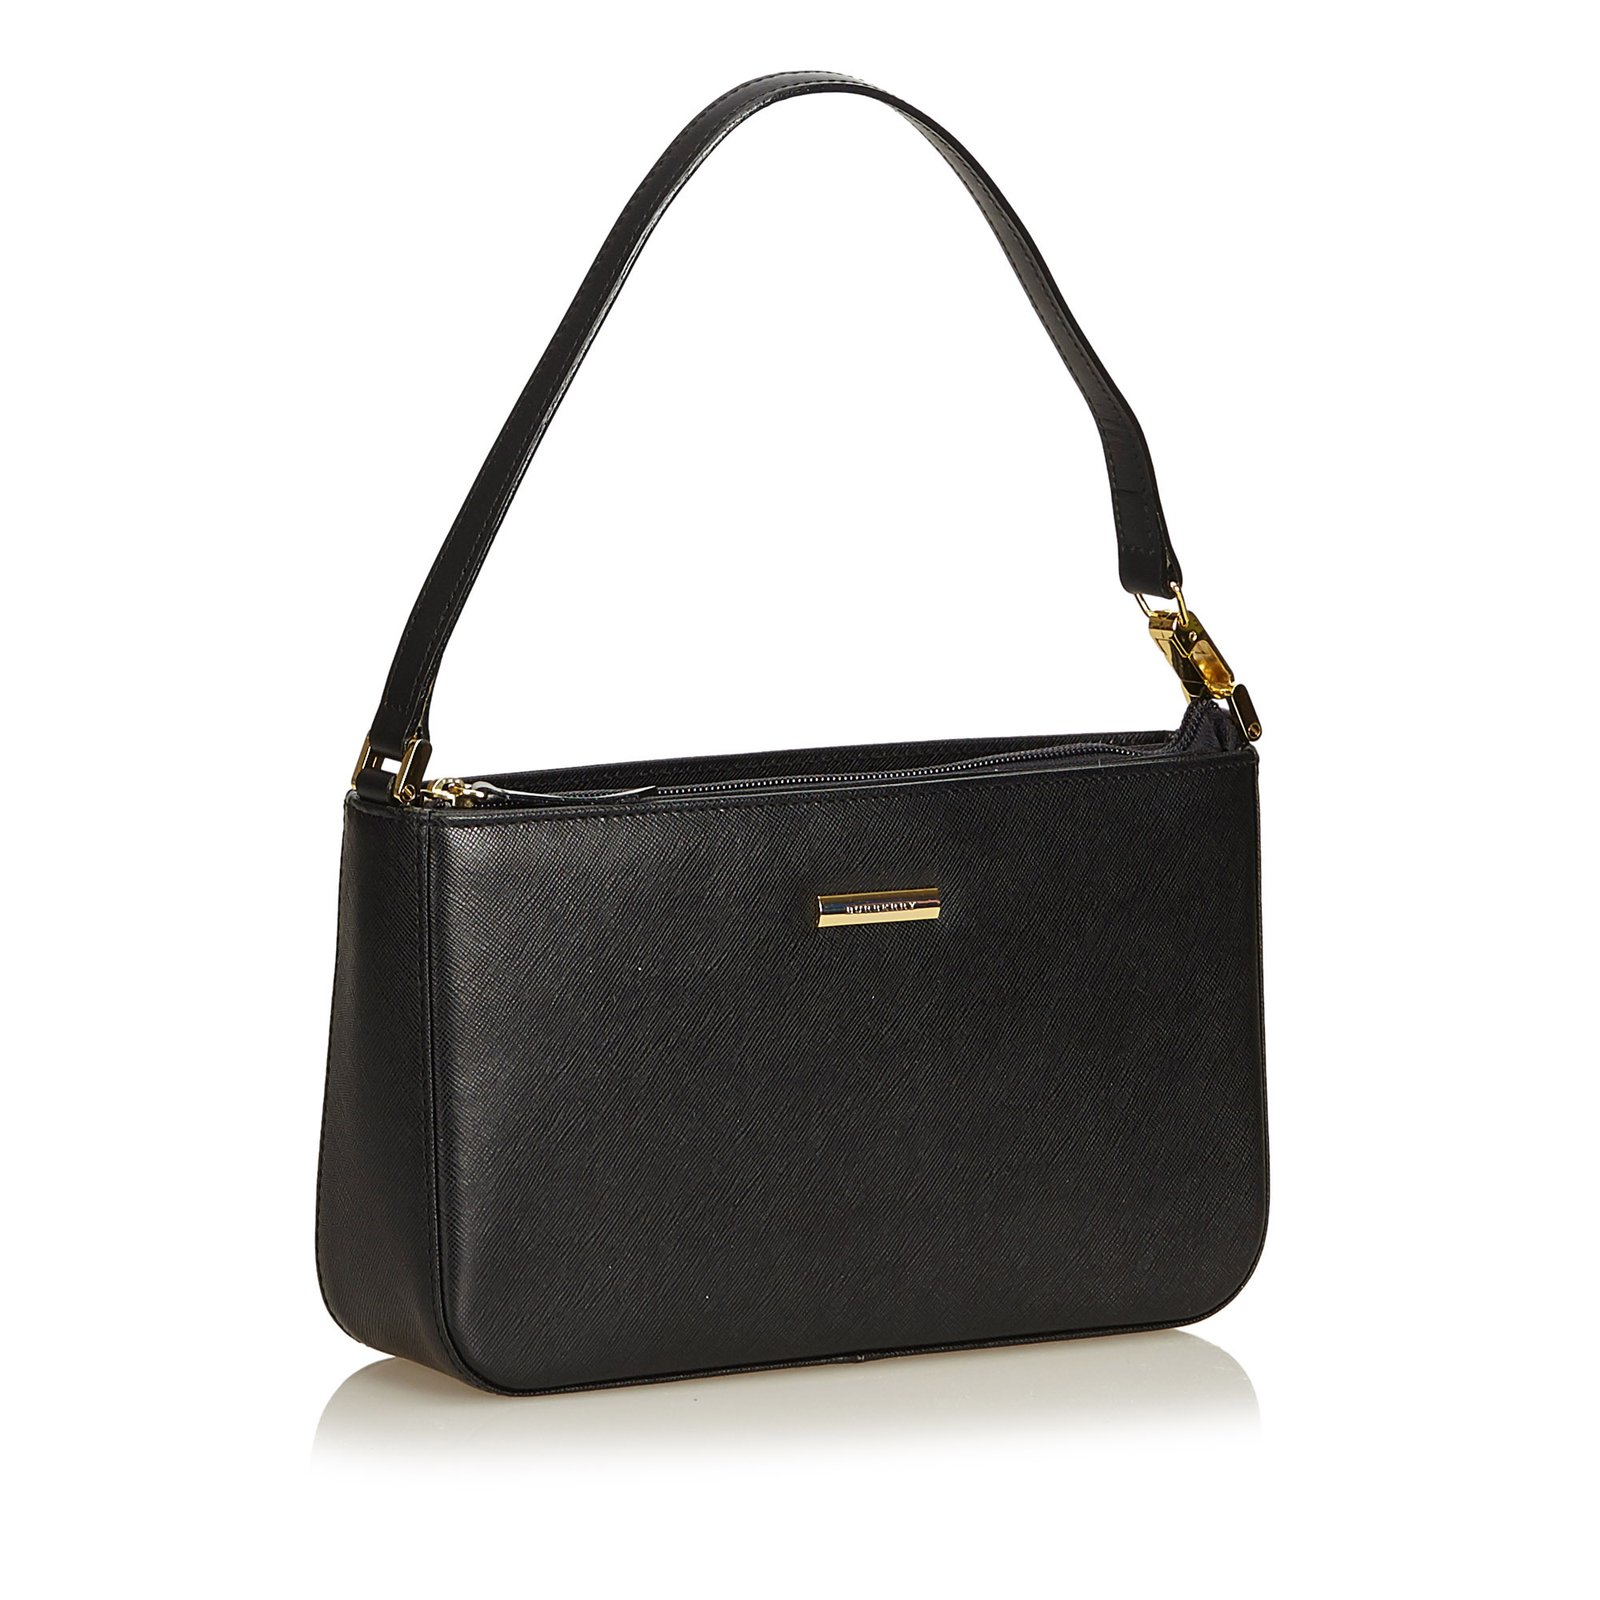 0ac6e900f107 Gallery Source · Burberry Leather Handbag Handbags Leather Other Black ref  91082